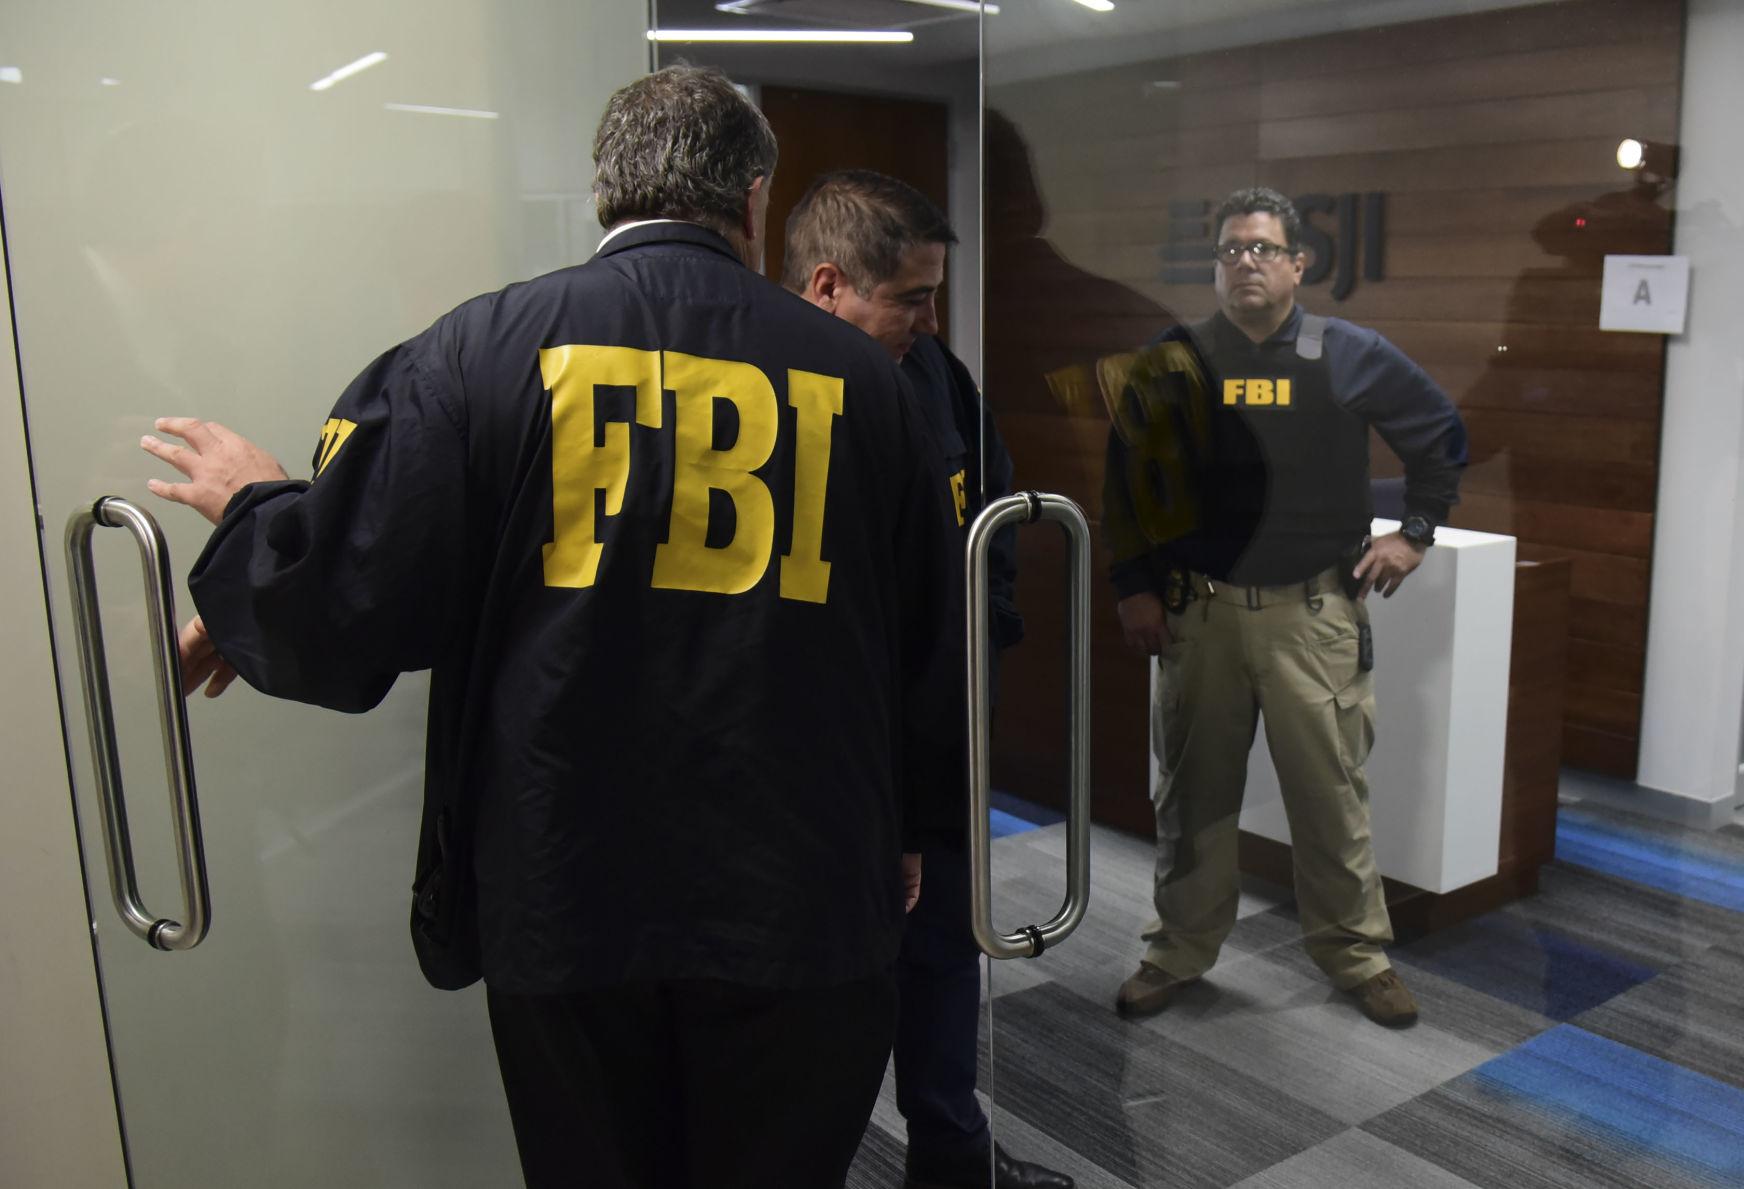 Knock, knock… FBI